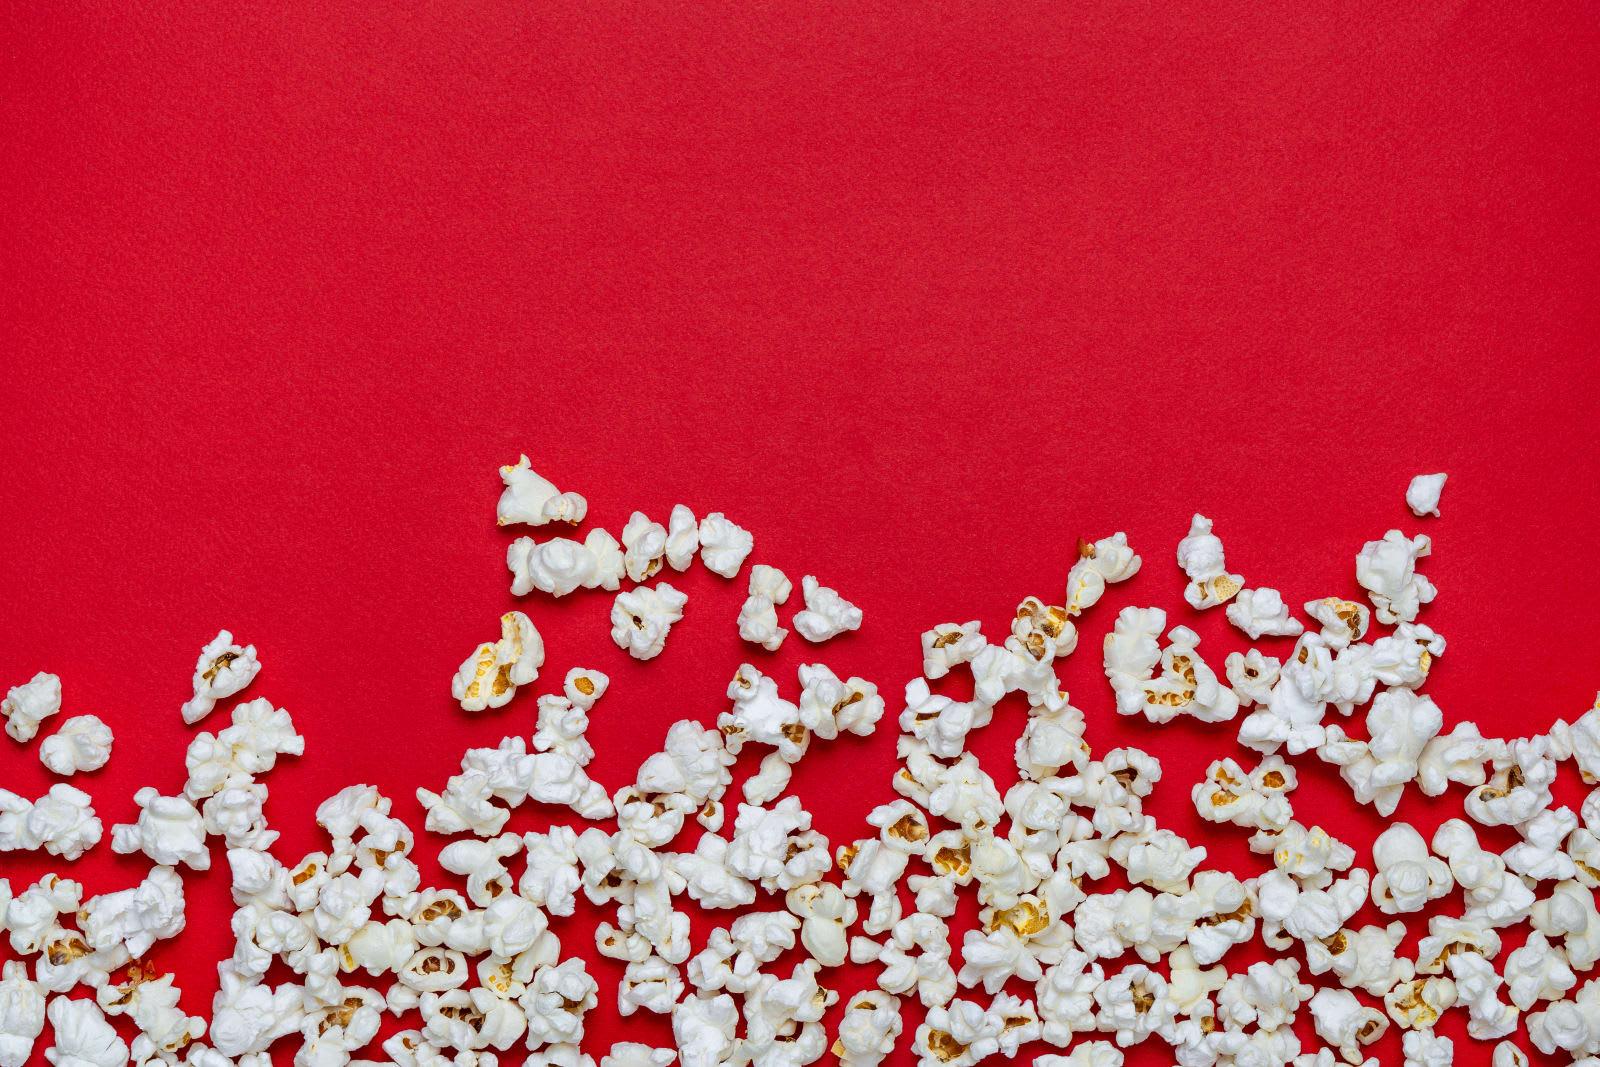 Regal Cinemas unveils its unlimited movie subscription service